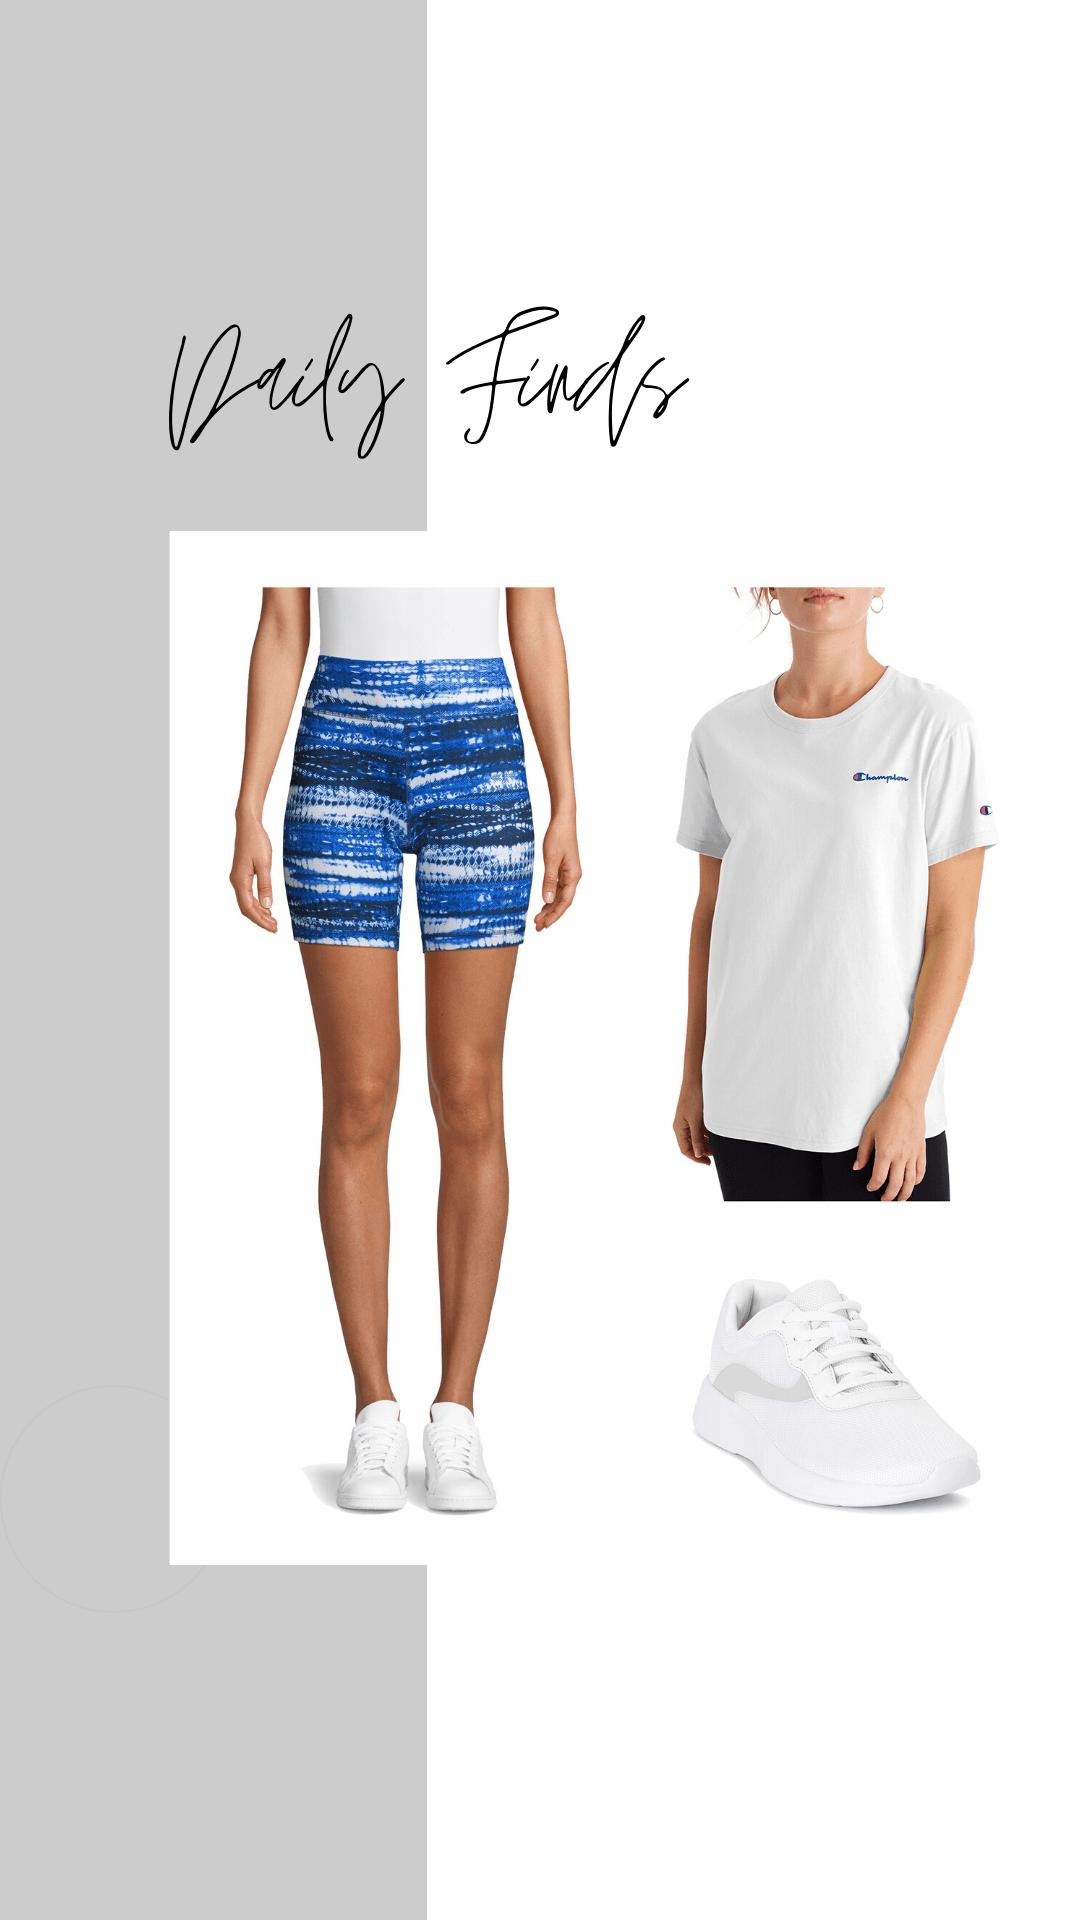 new athletic works tie dye bike shorts, champion boyfriend tee, and mesh sneakers